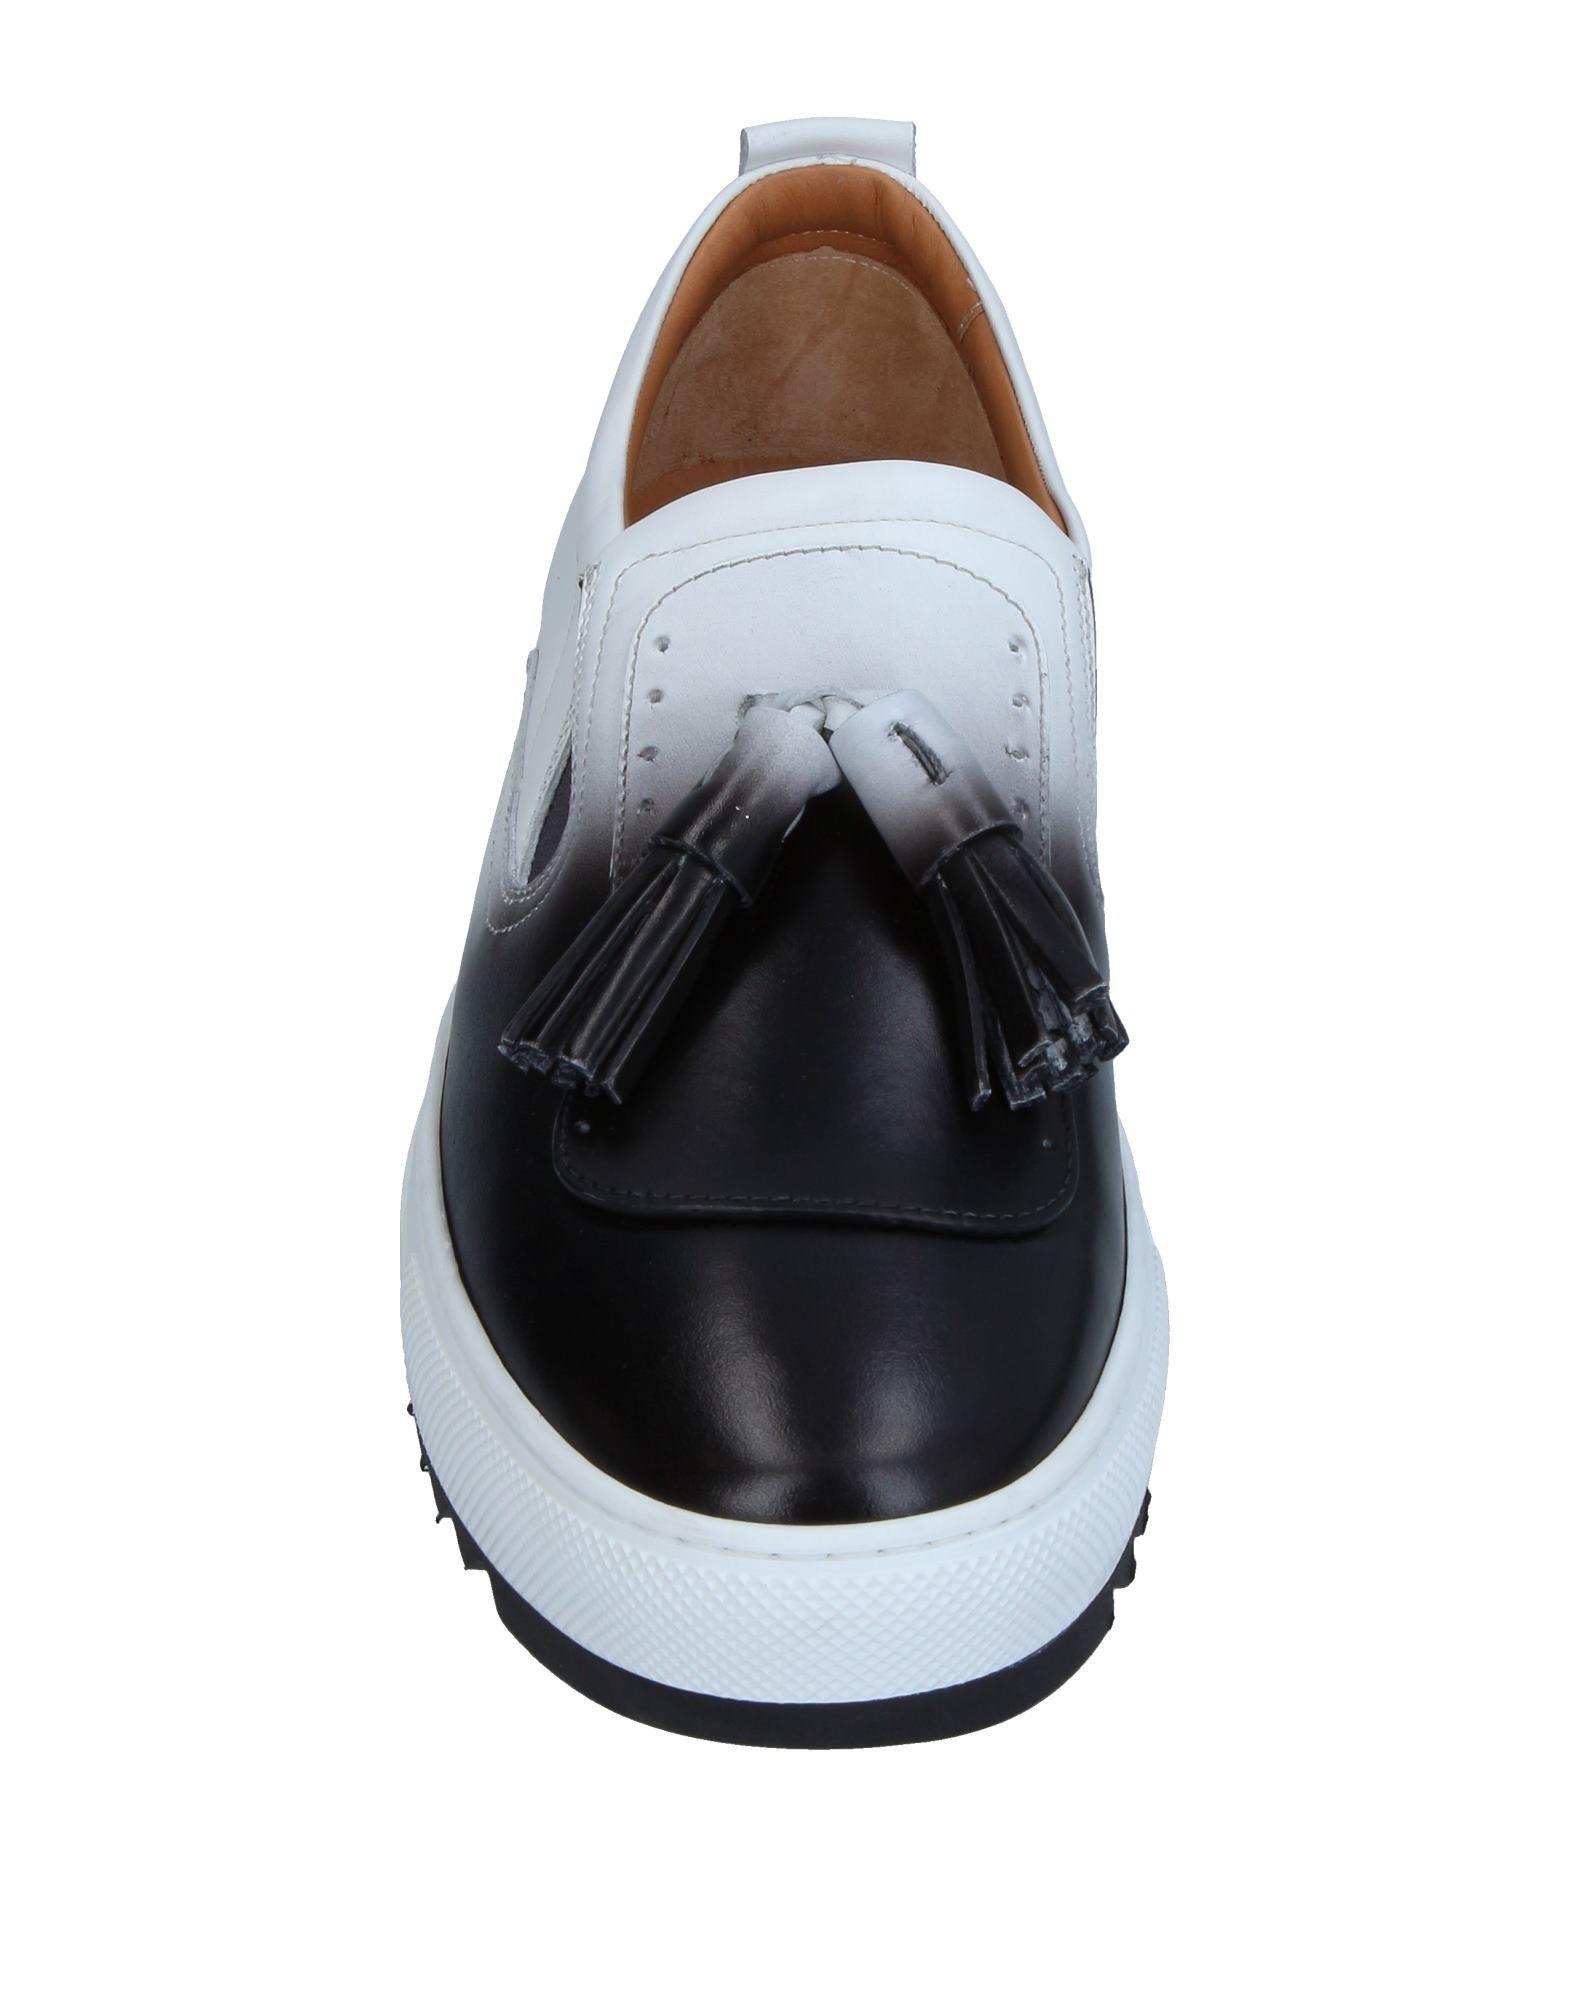 Salvatore Ferragamo Mokassins Qualität Herren  11356946GW Gute Qualität Mokassins beliebte Schuhe acd25d